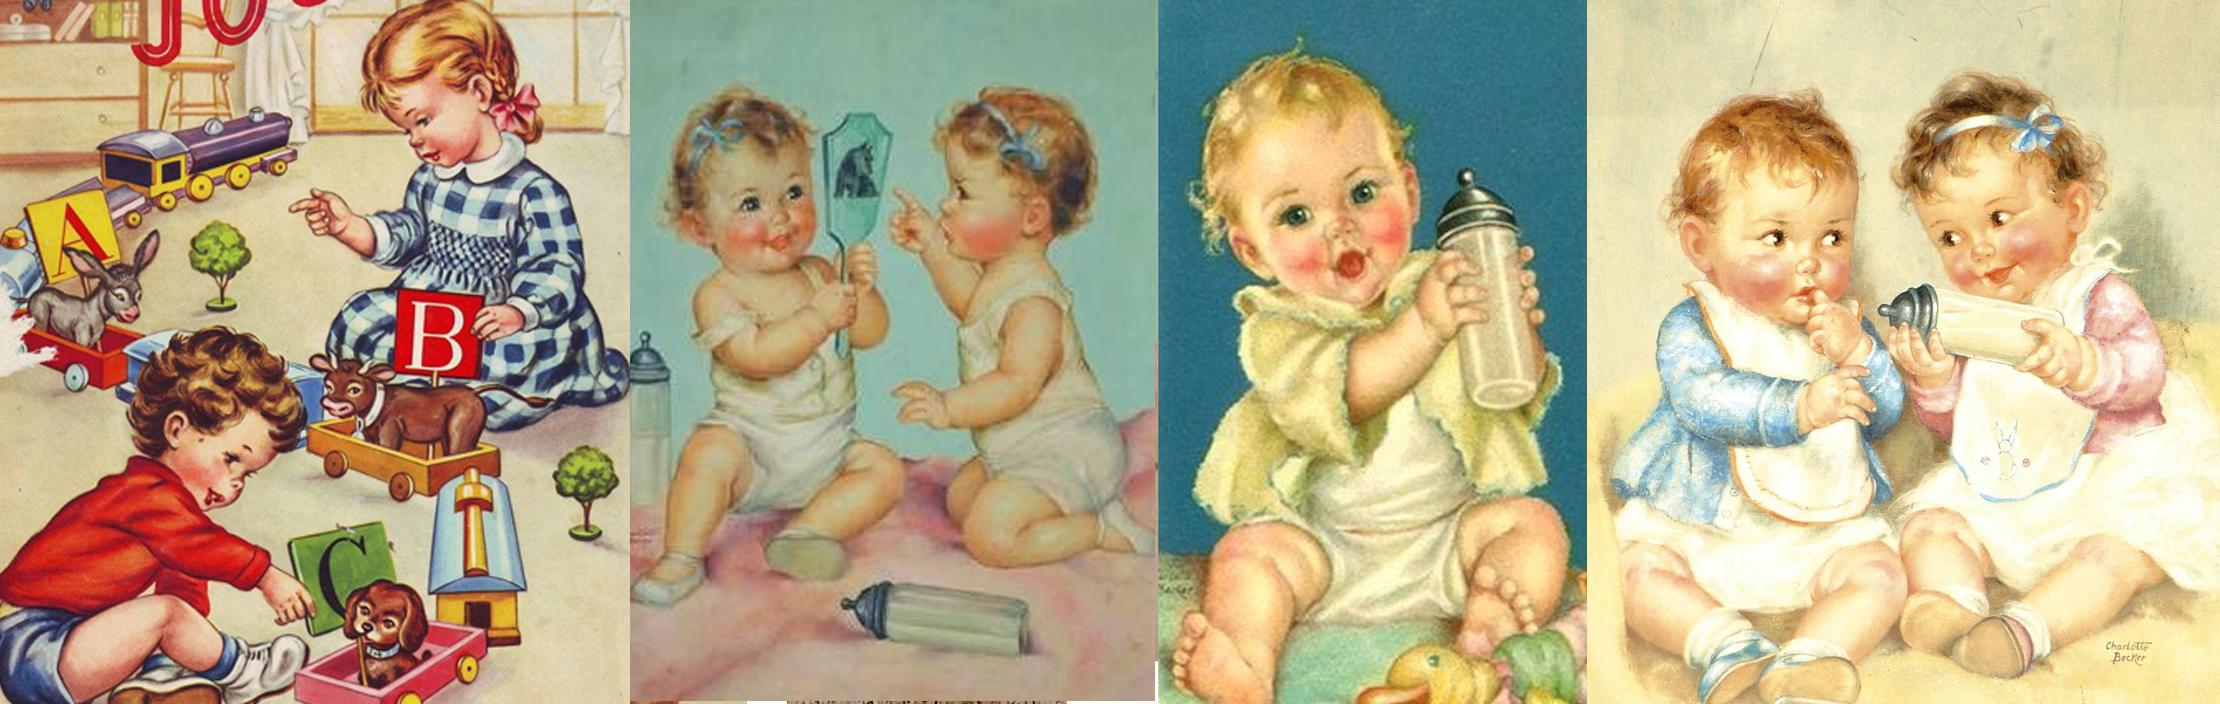 blog new babies for MG.jpg